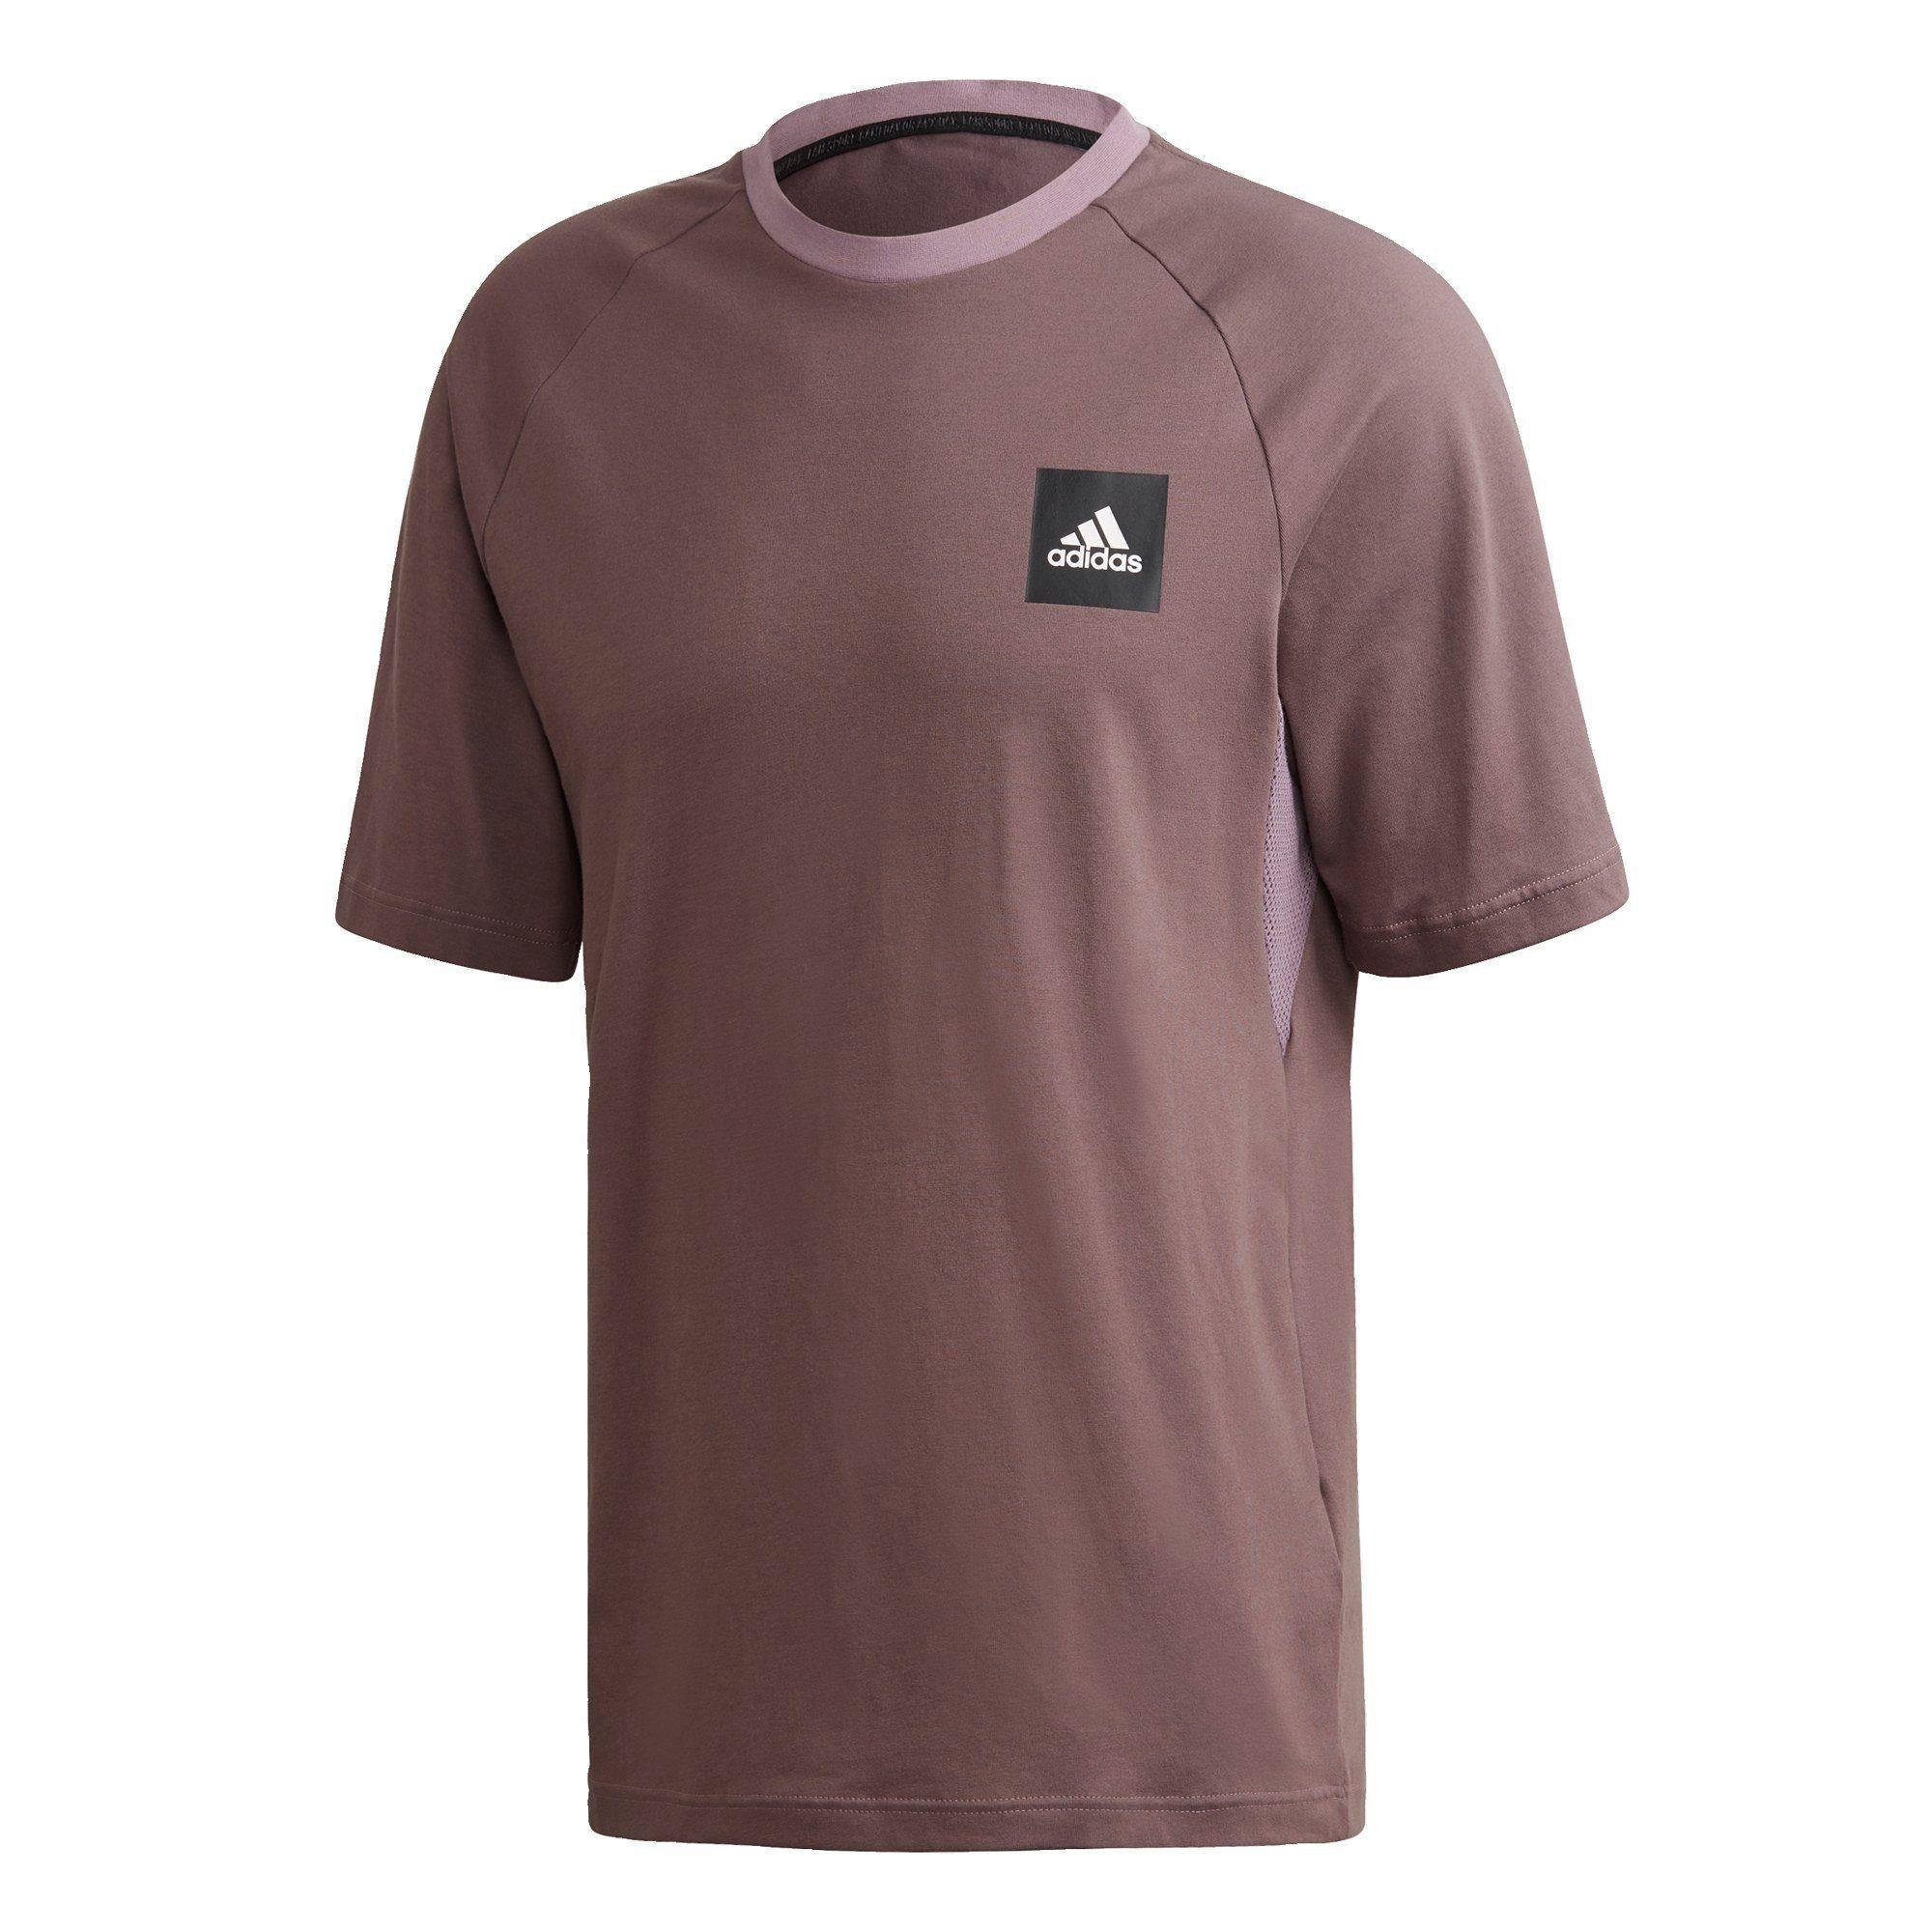 adidas Performance T Shirt »Must Haves Stadium T Shirt« Must Haves online kaufen | OTTO